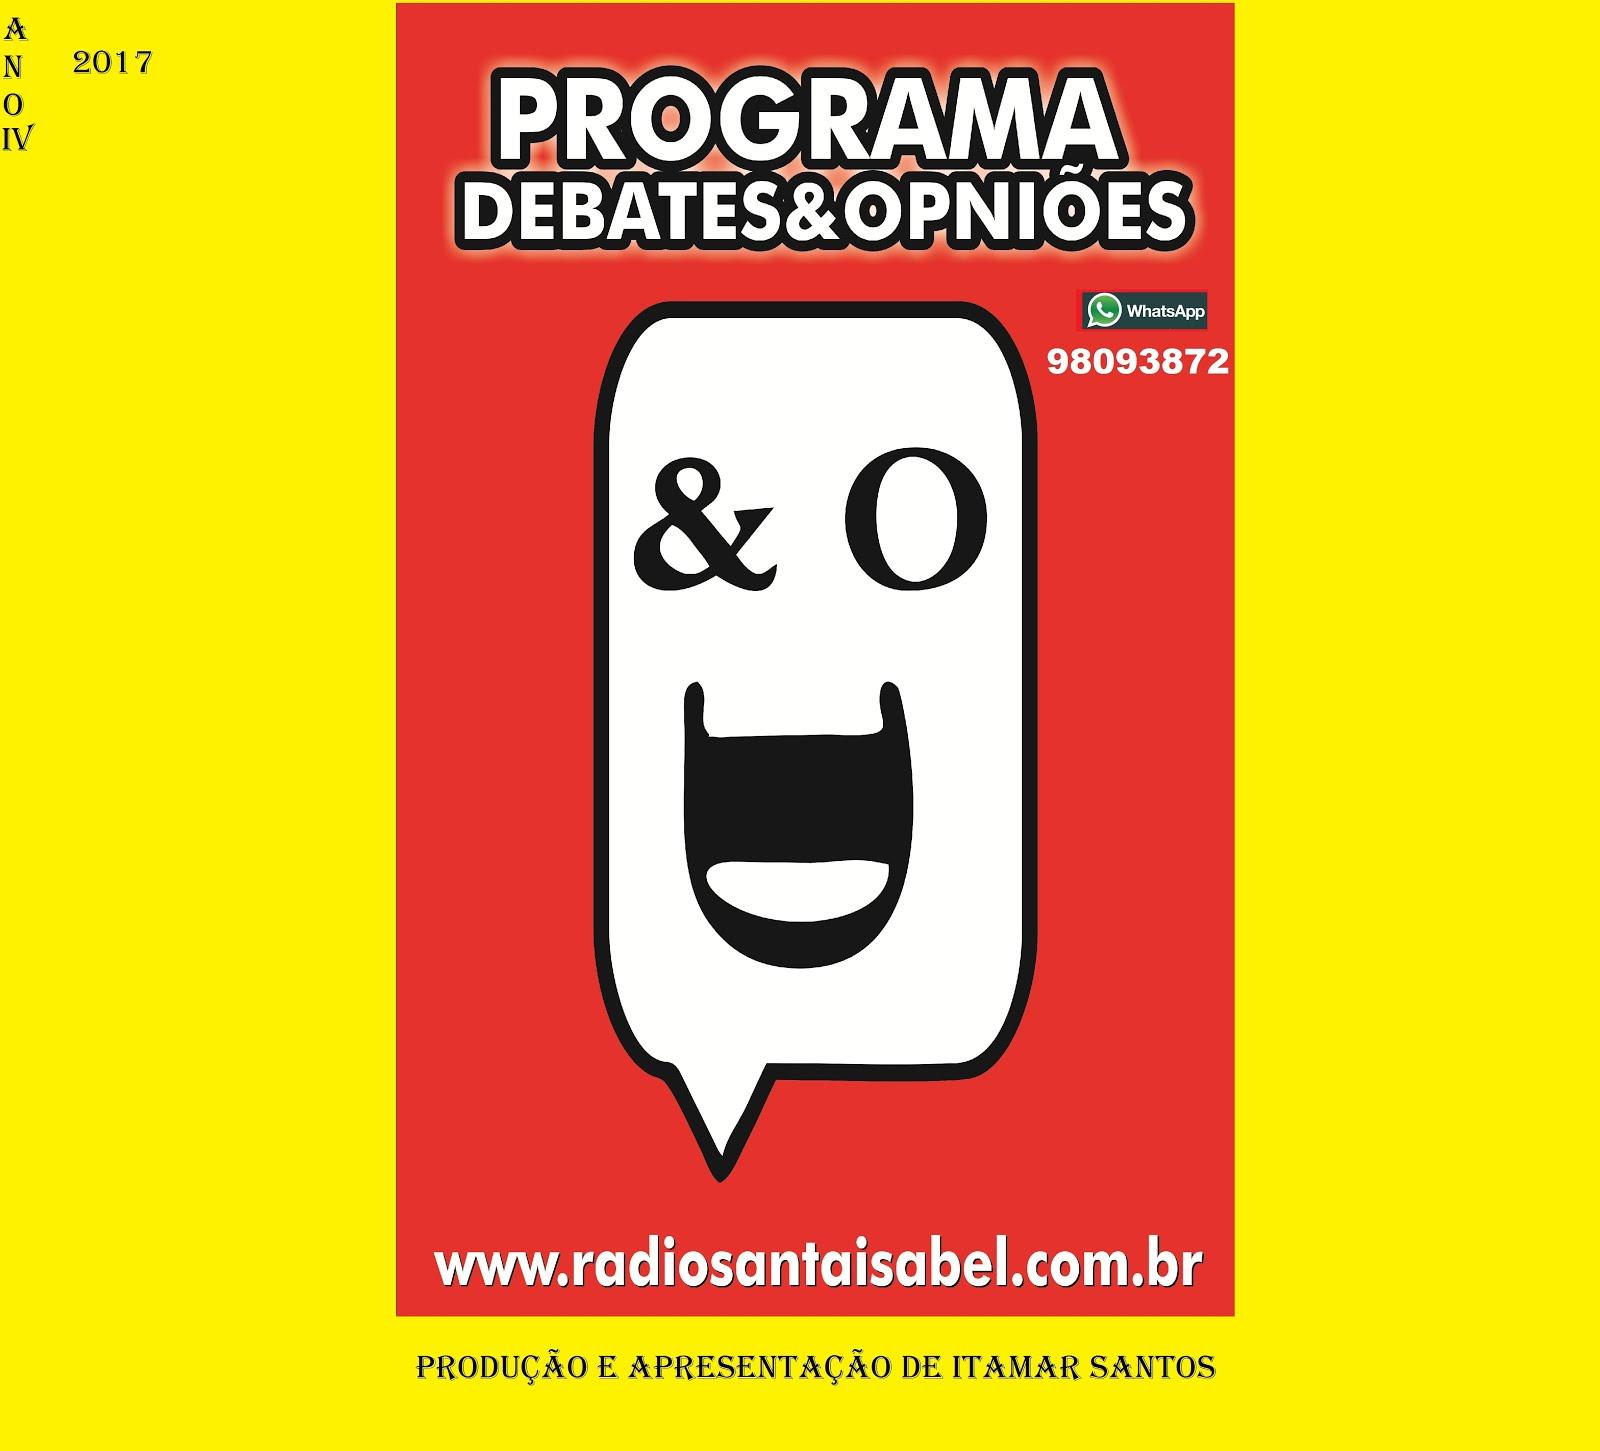 Programa Debates&Opiniões